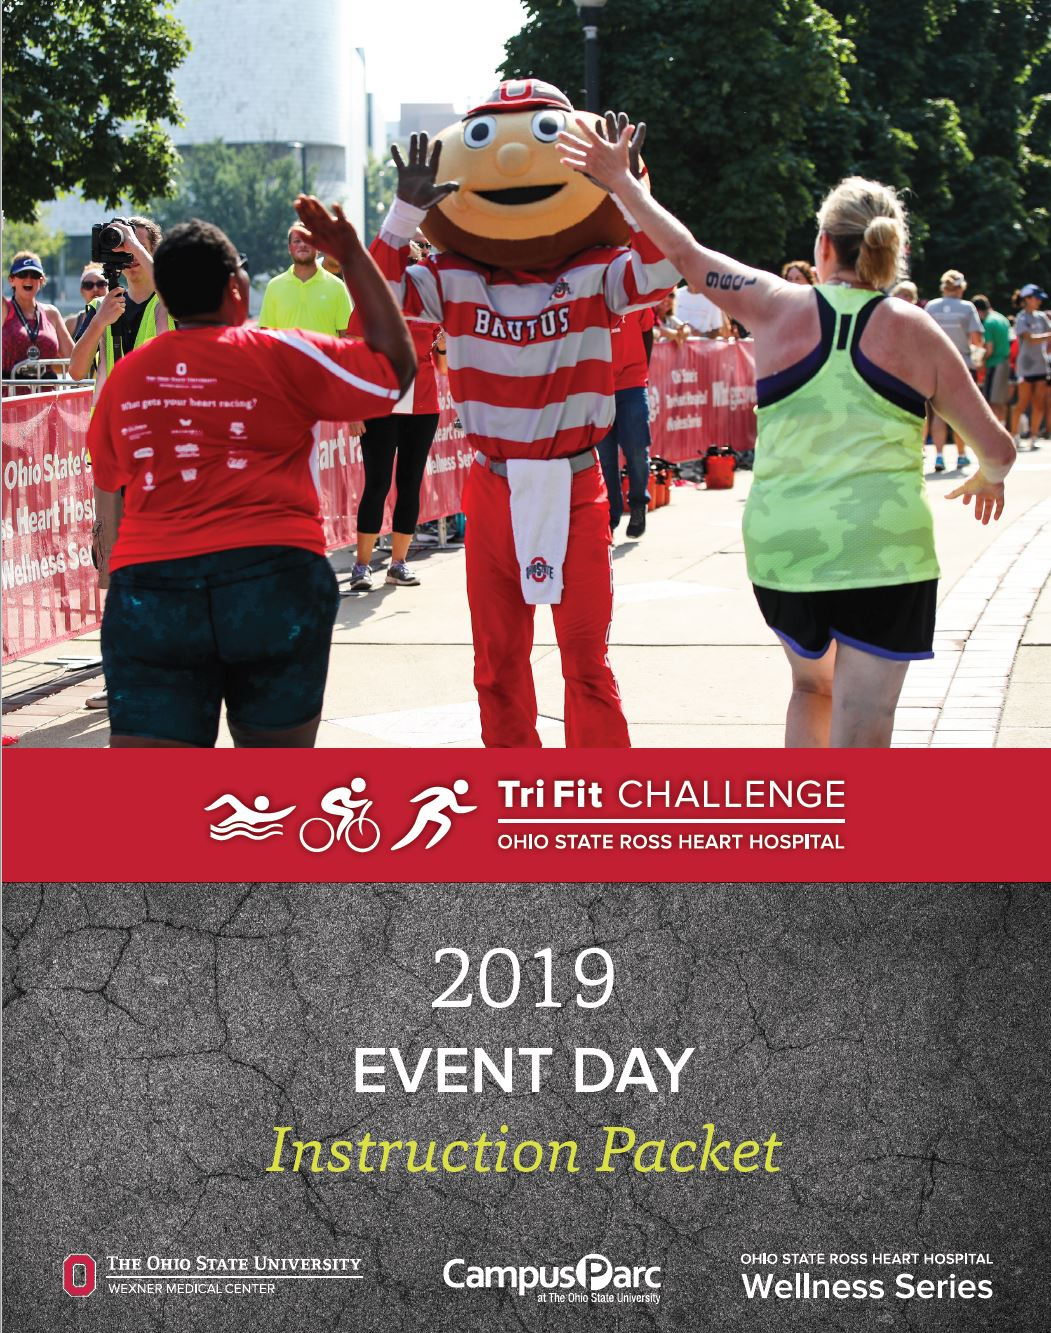 2019 — Ohio State Ross Heart Hospital TriFit Challenge Triathlon